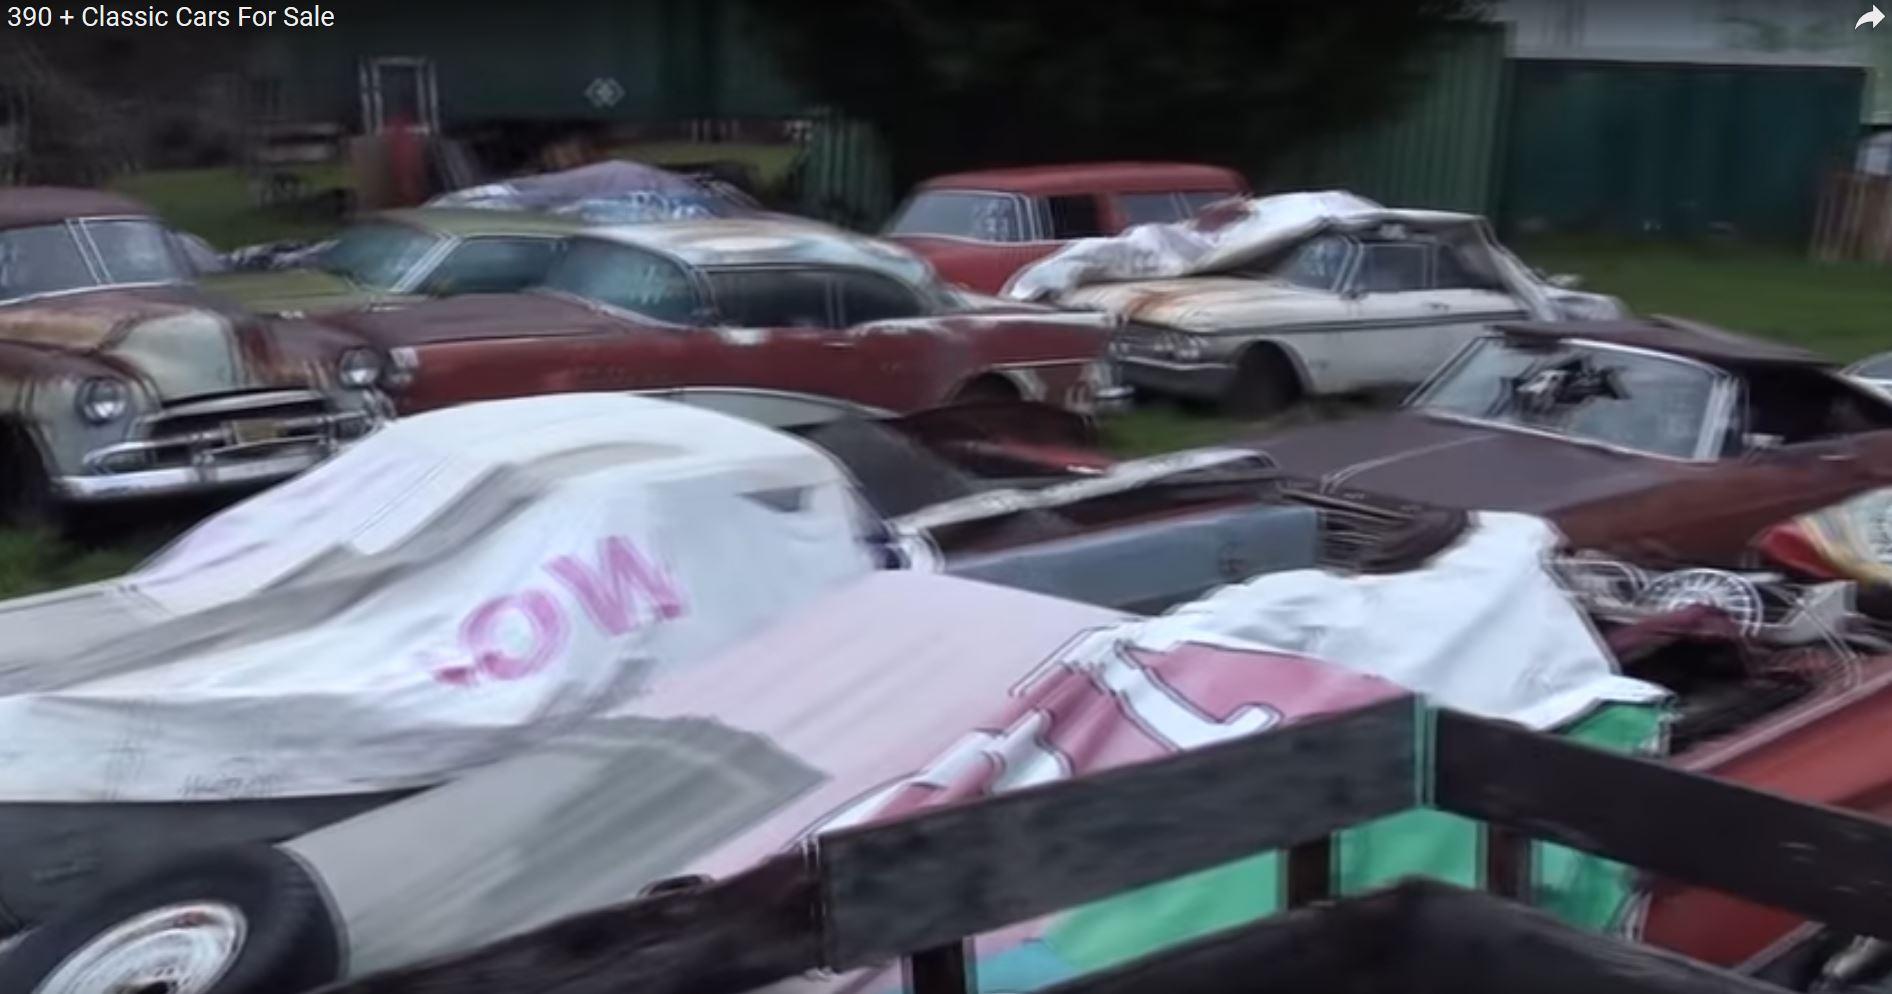 390 Car Collection plus parts, Medford Oregon area - Cars